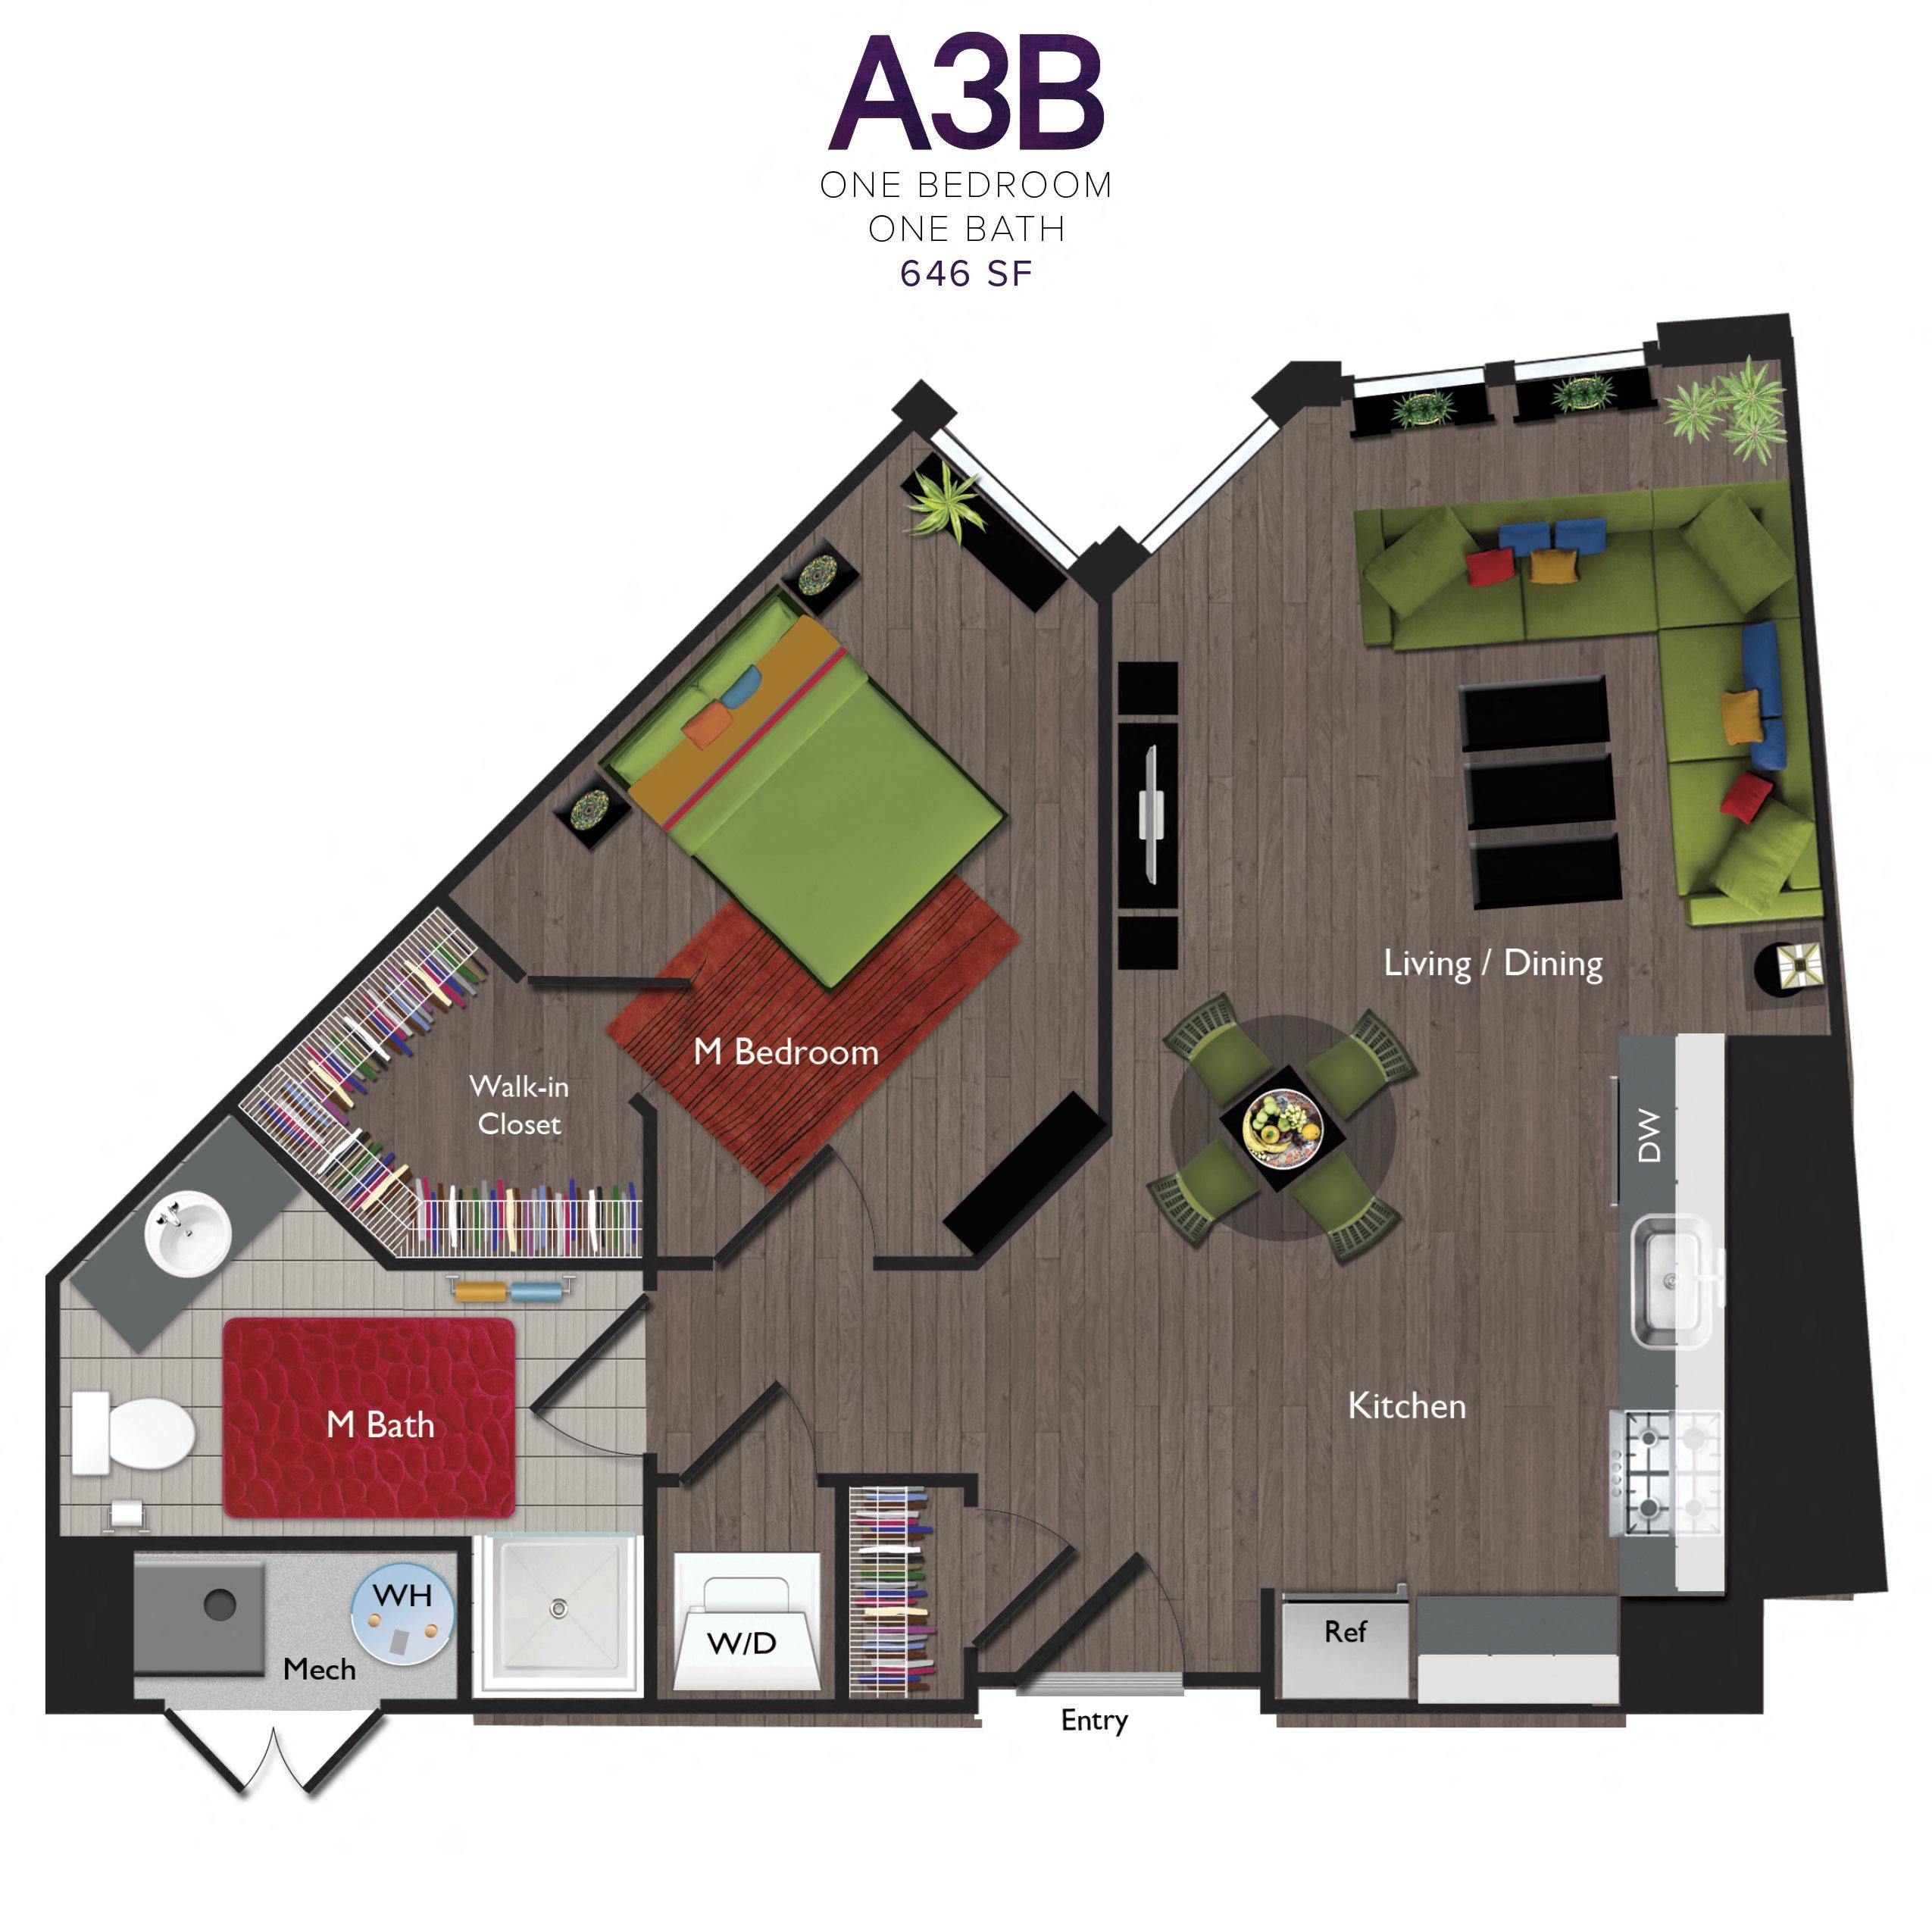 One Bedroom/One Bathroom (A03B) Floor Plan 19